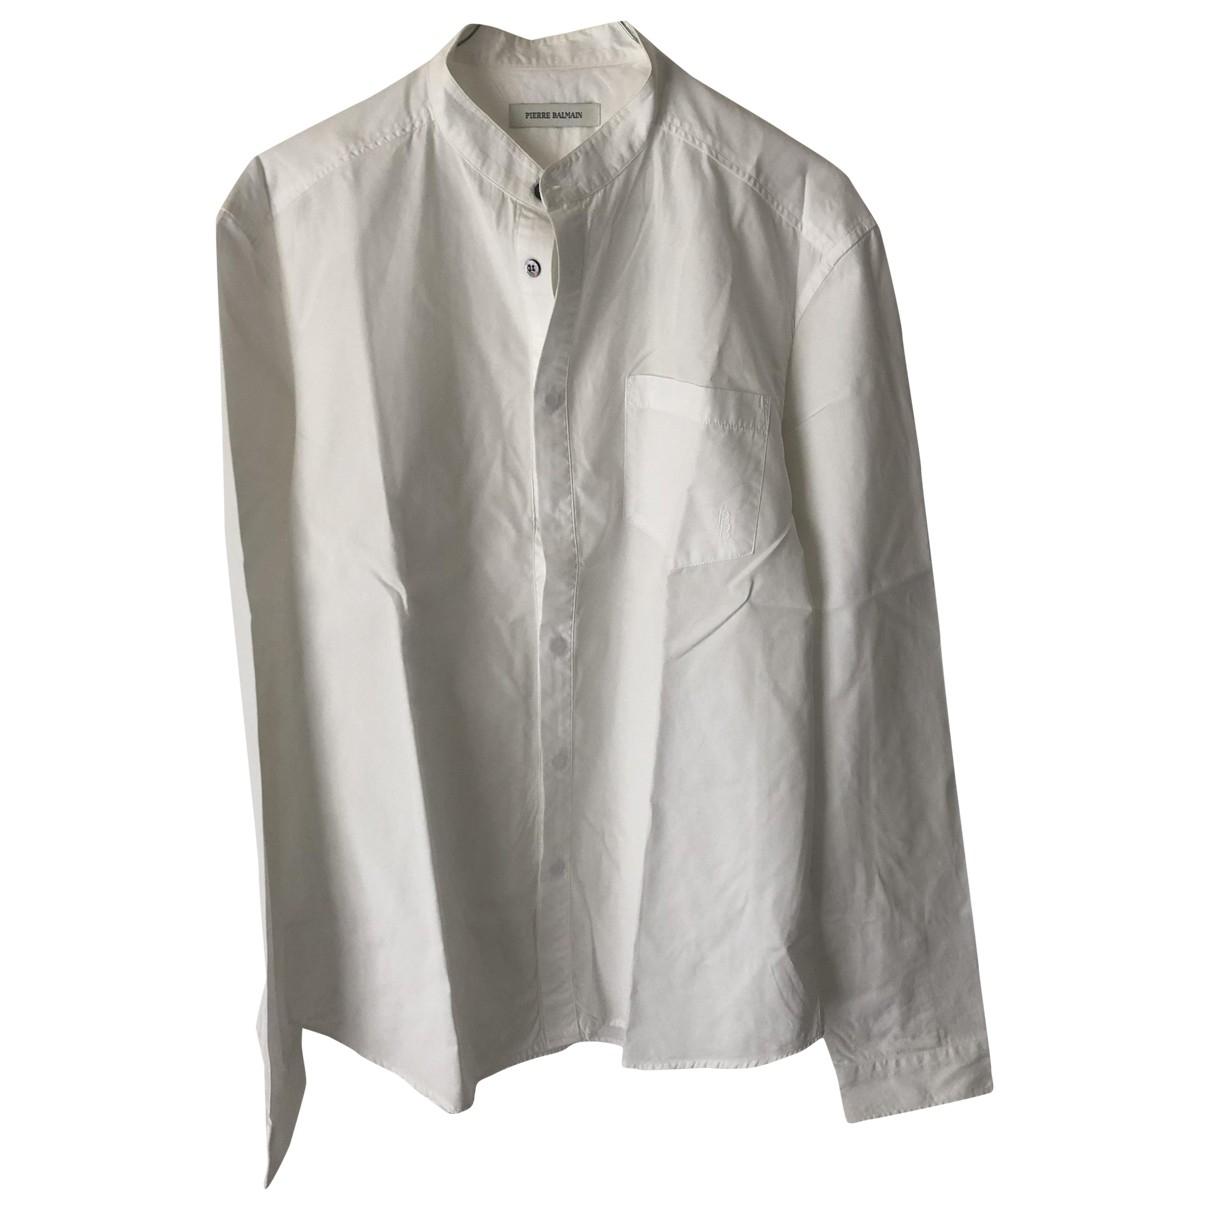 Camisas Pierre Balmain